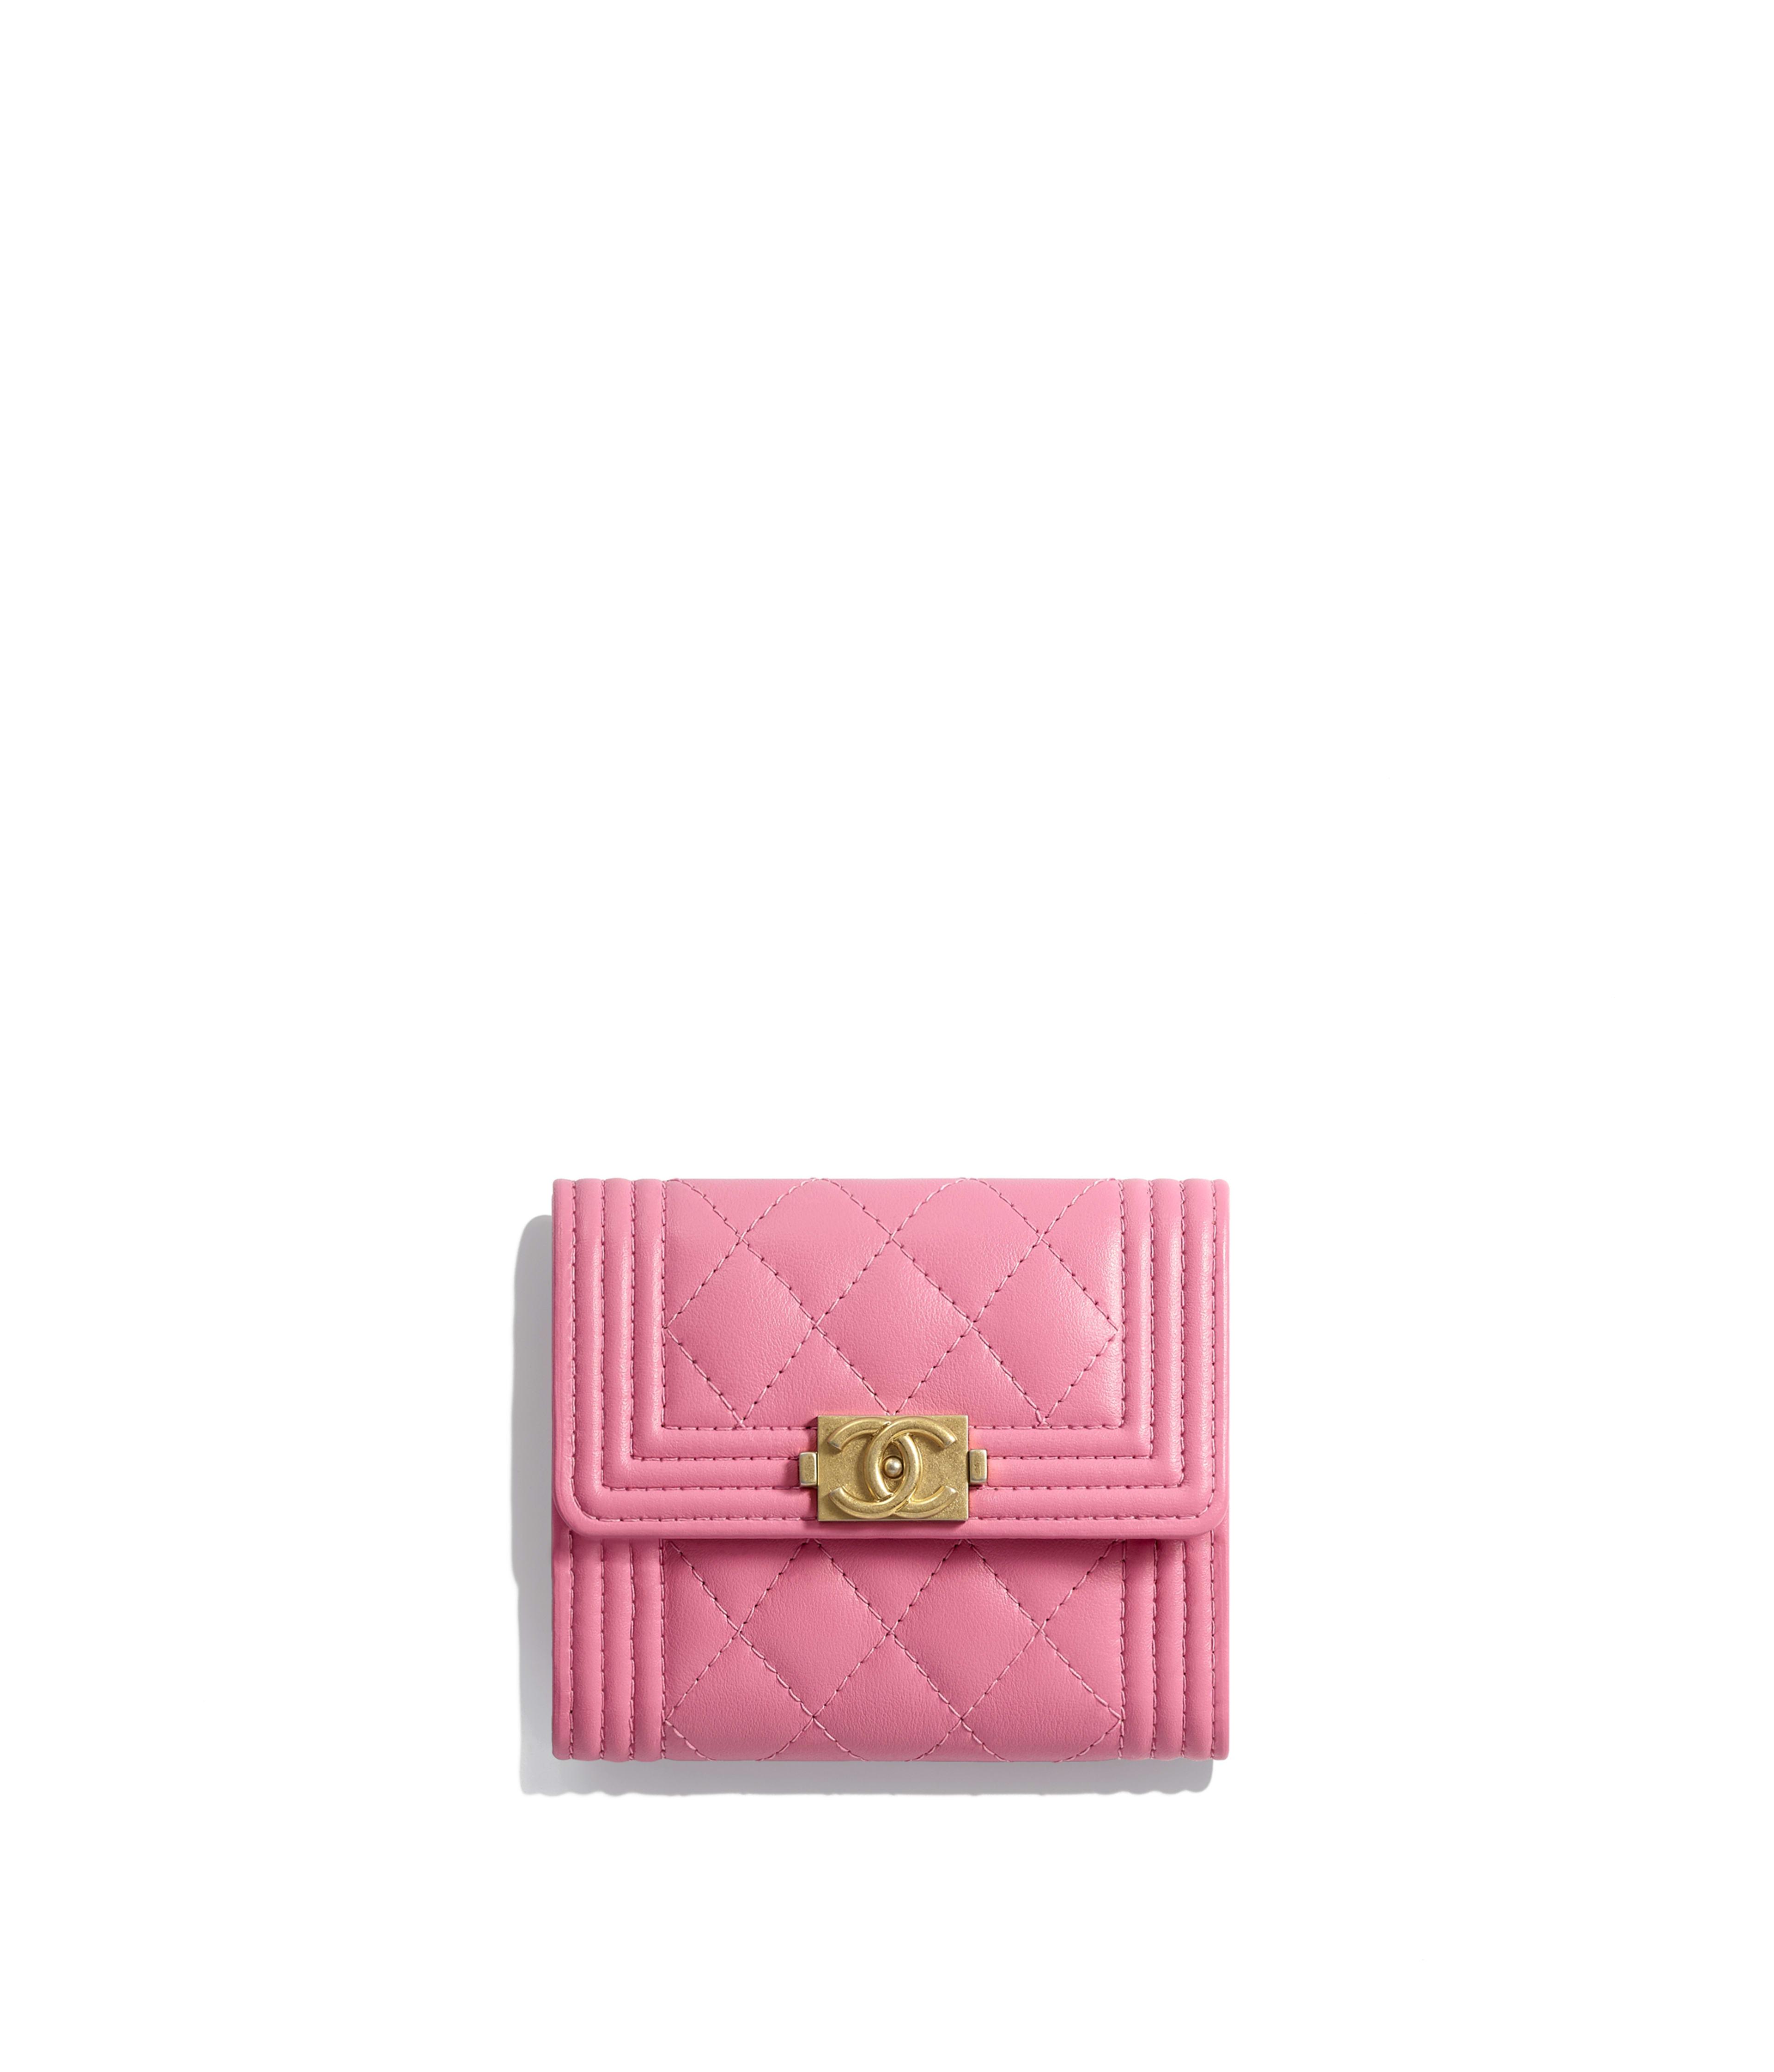 Boy Chanel Small Flap Wallet Calfskin Gold Tone Metal Pink Ref A84068y099395b454